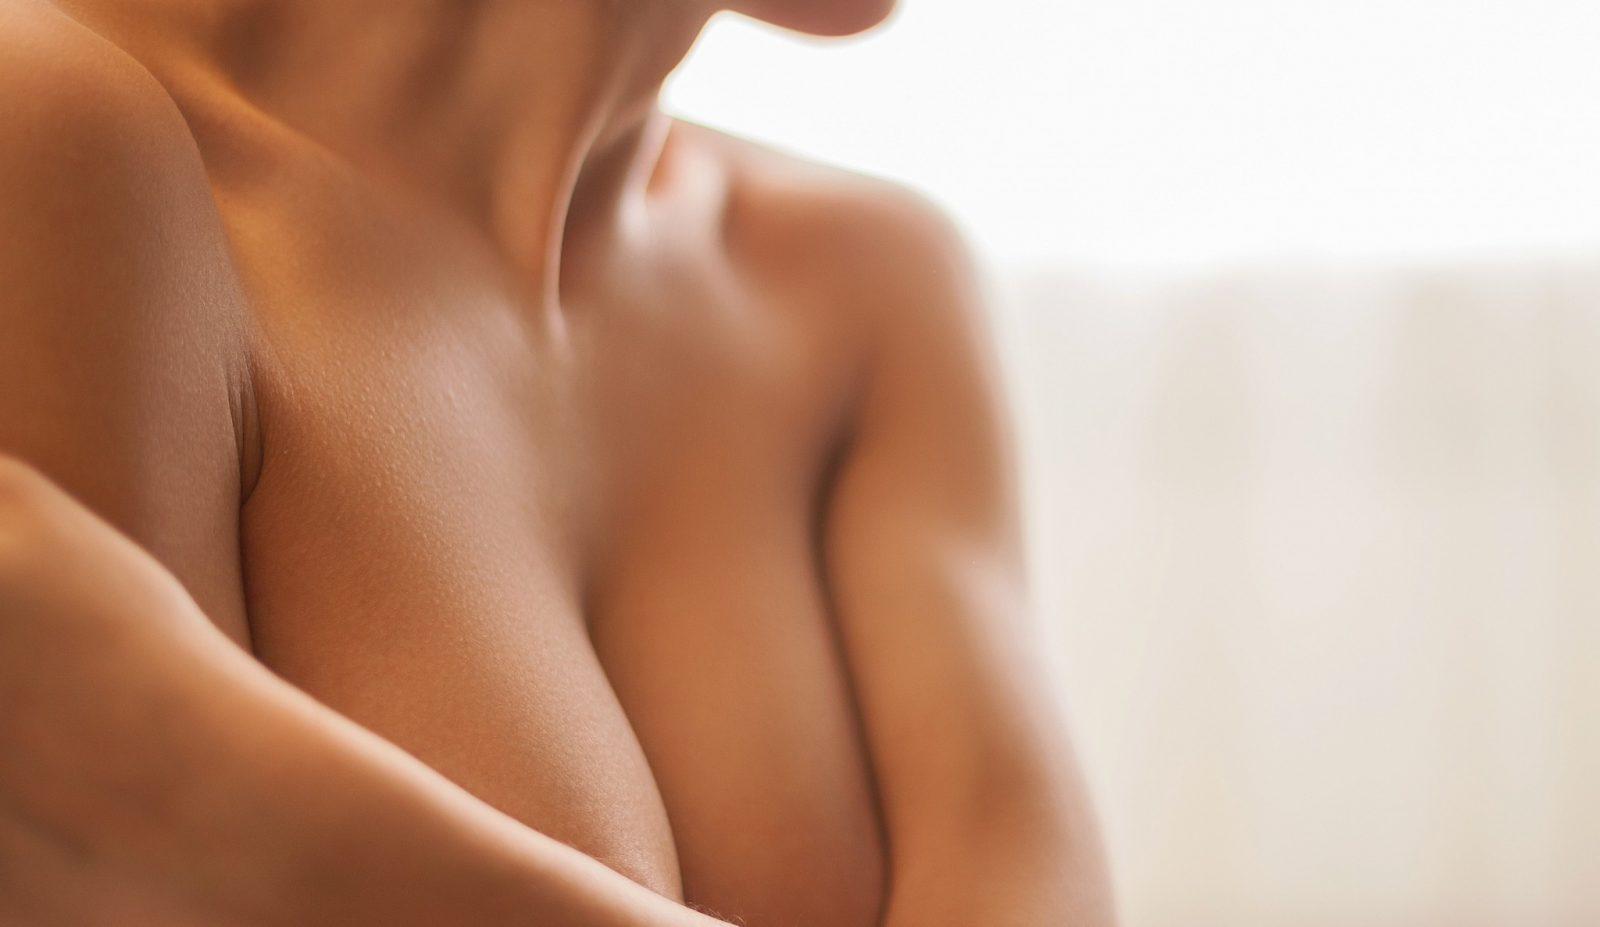 jovem pondera aumento mamário sem prótese